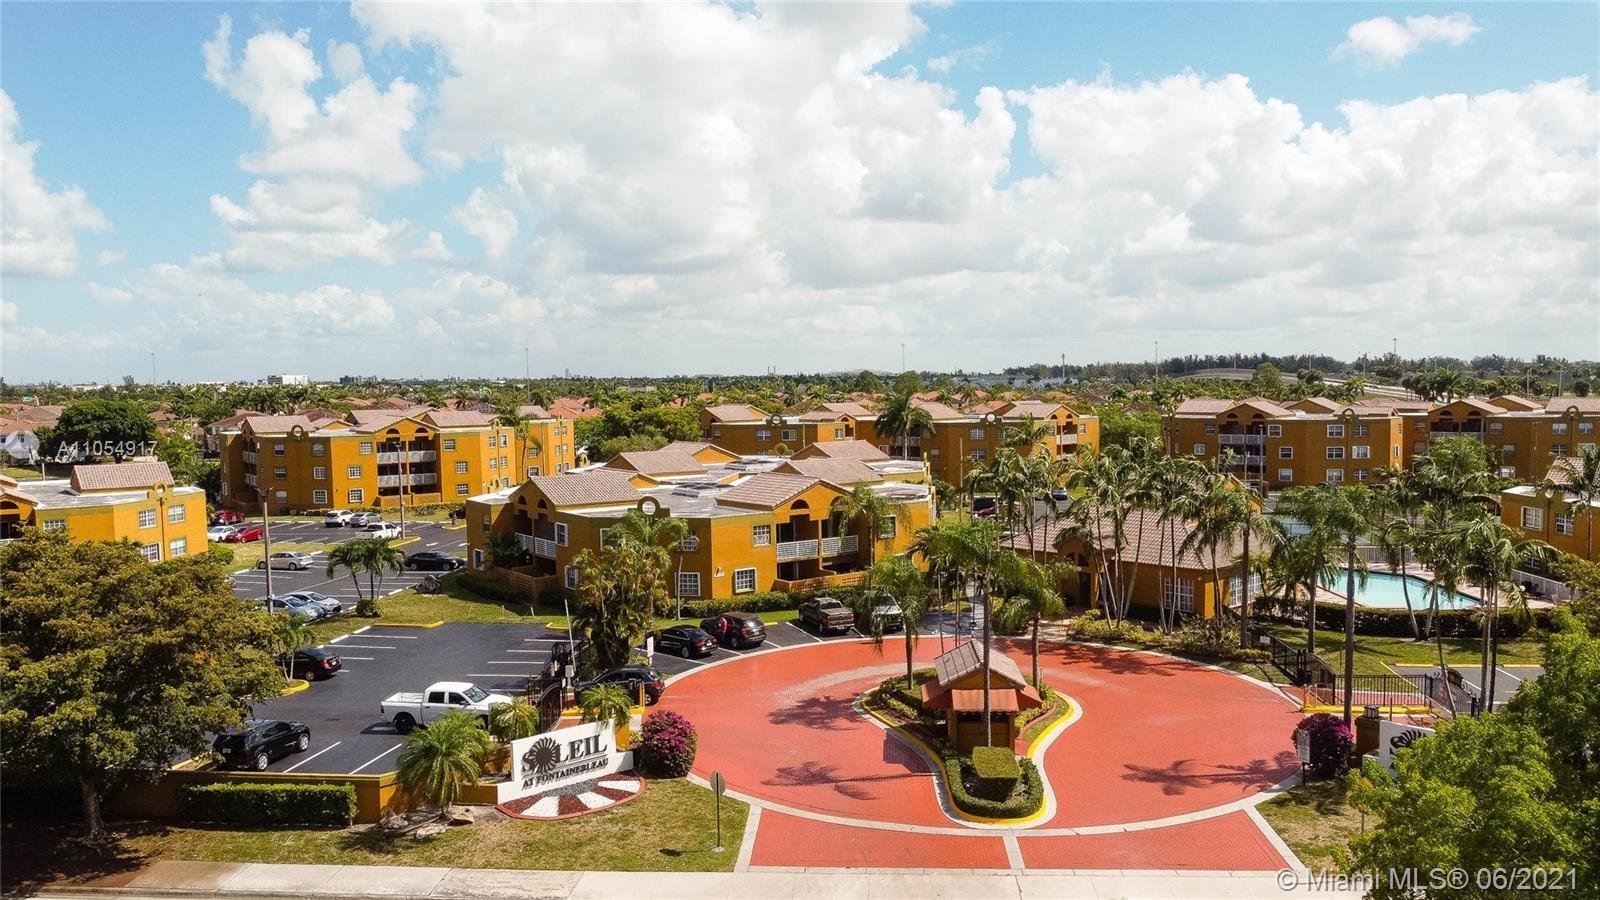 9701 Fontainebleau Blvd #C107, Miami, FL 33172 - #: A11054917